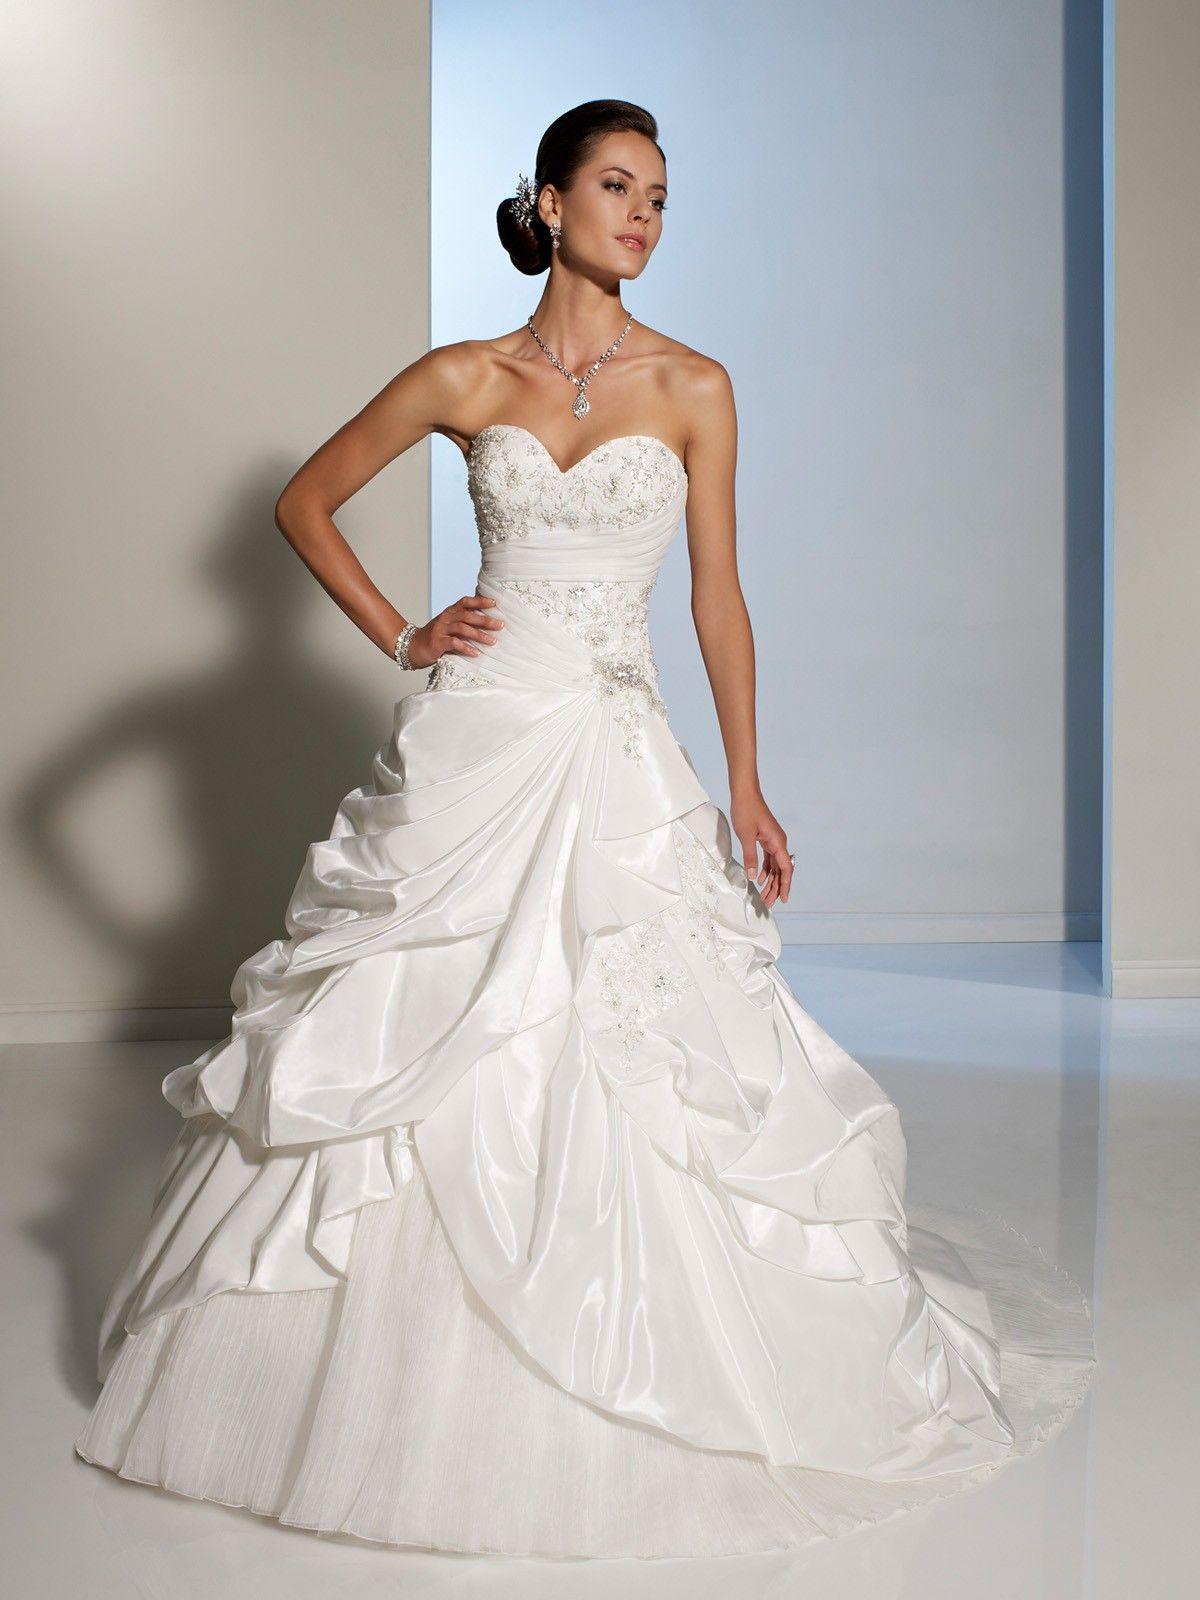 Wedding Dress 2 My Wedding Pinterest White Wedding Dresses - White Wedding Dress